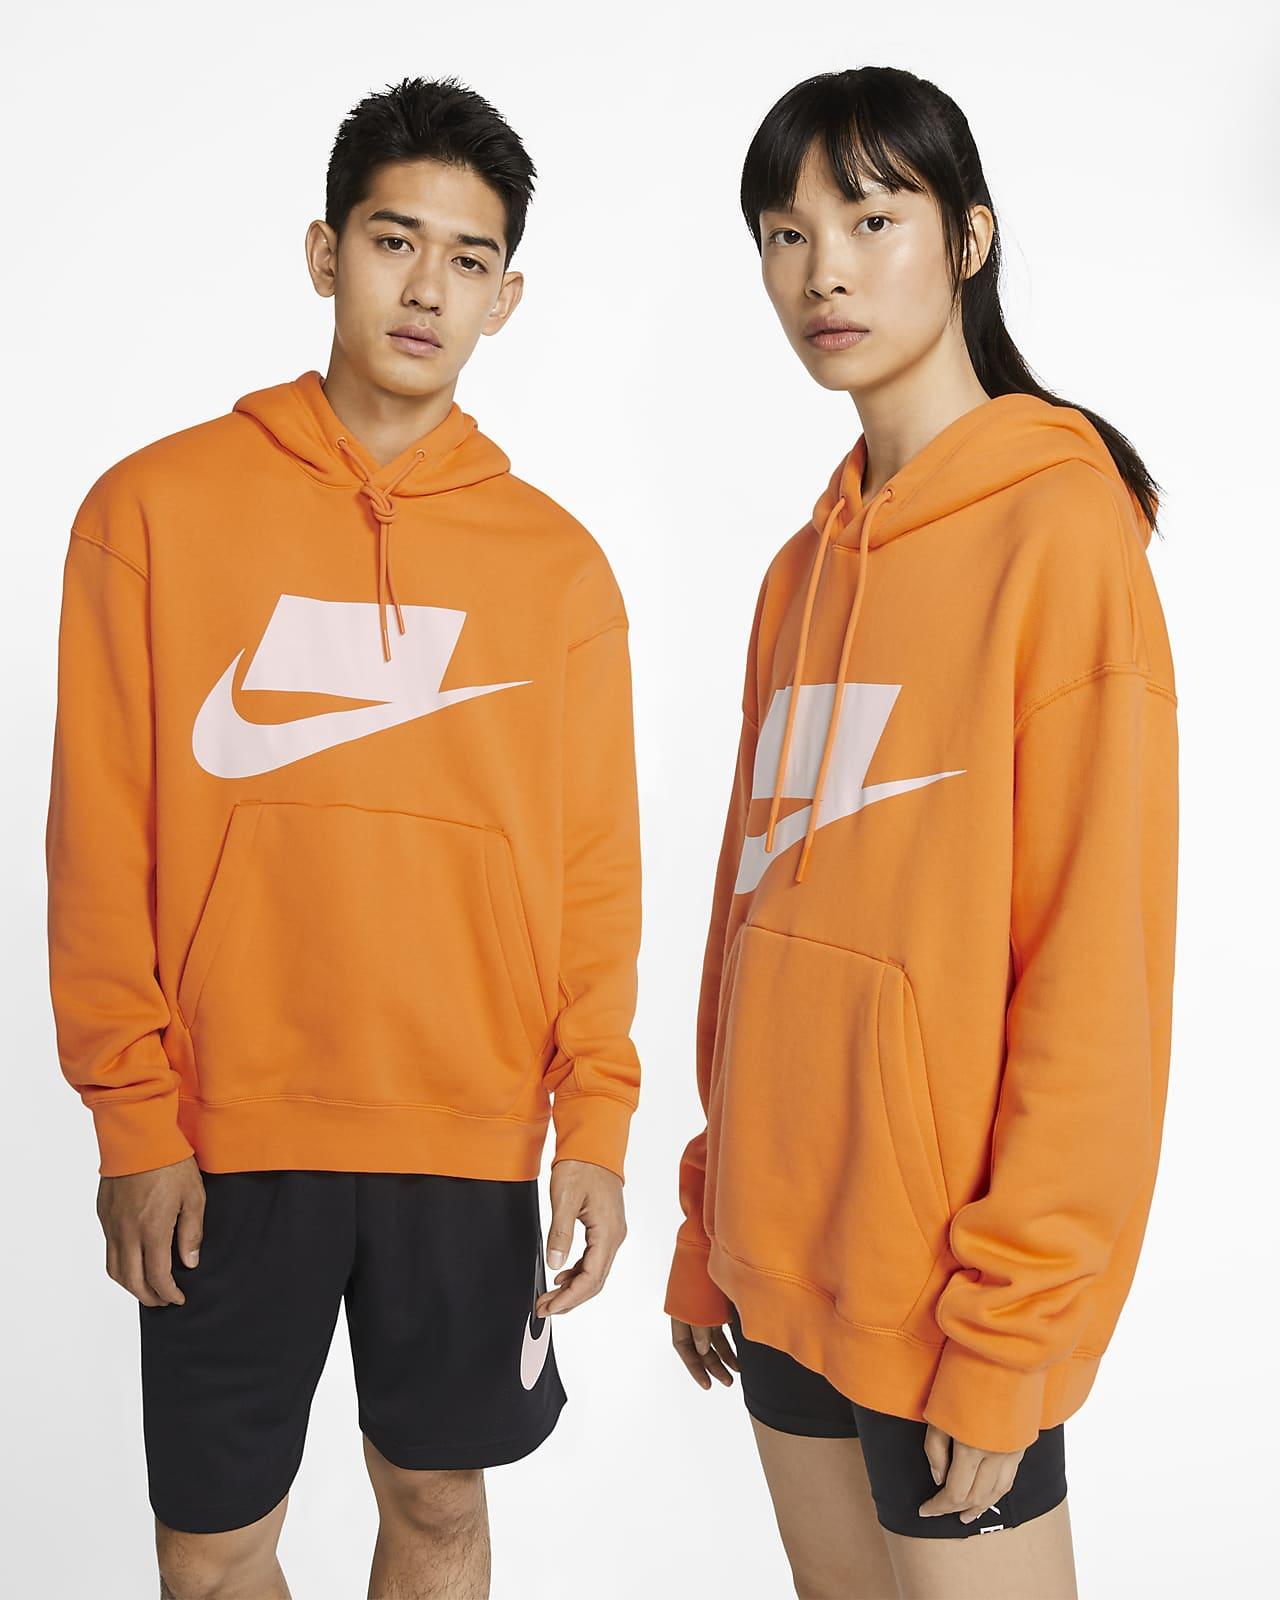 foro Alentar Ciro  Nike Sportswear Nike Sport Pack Men's French Terry Pullover Hoodie. Nike IN